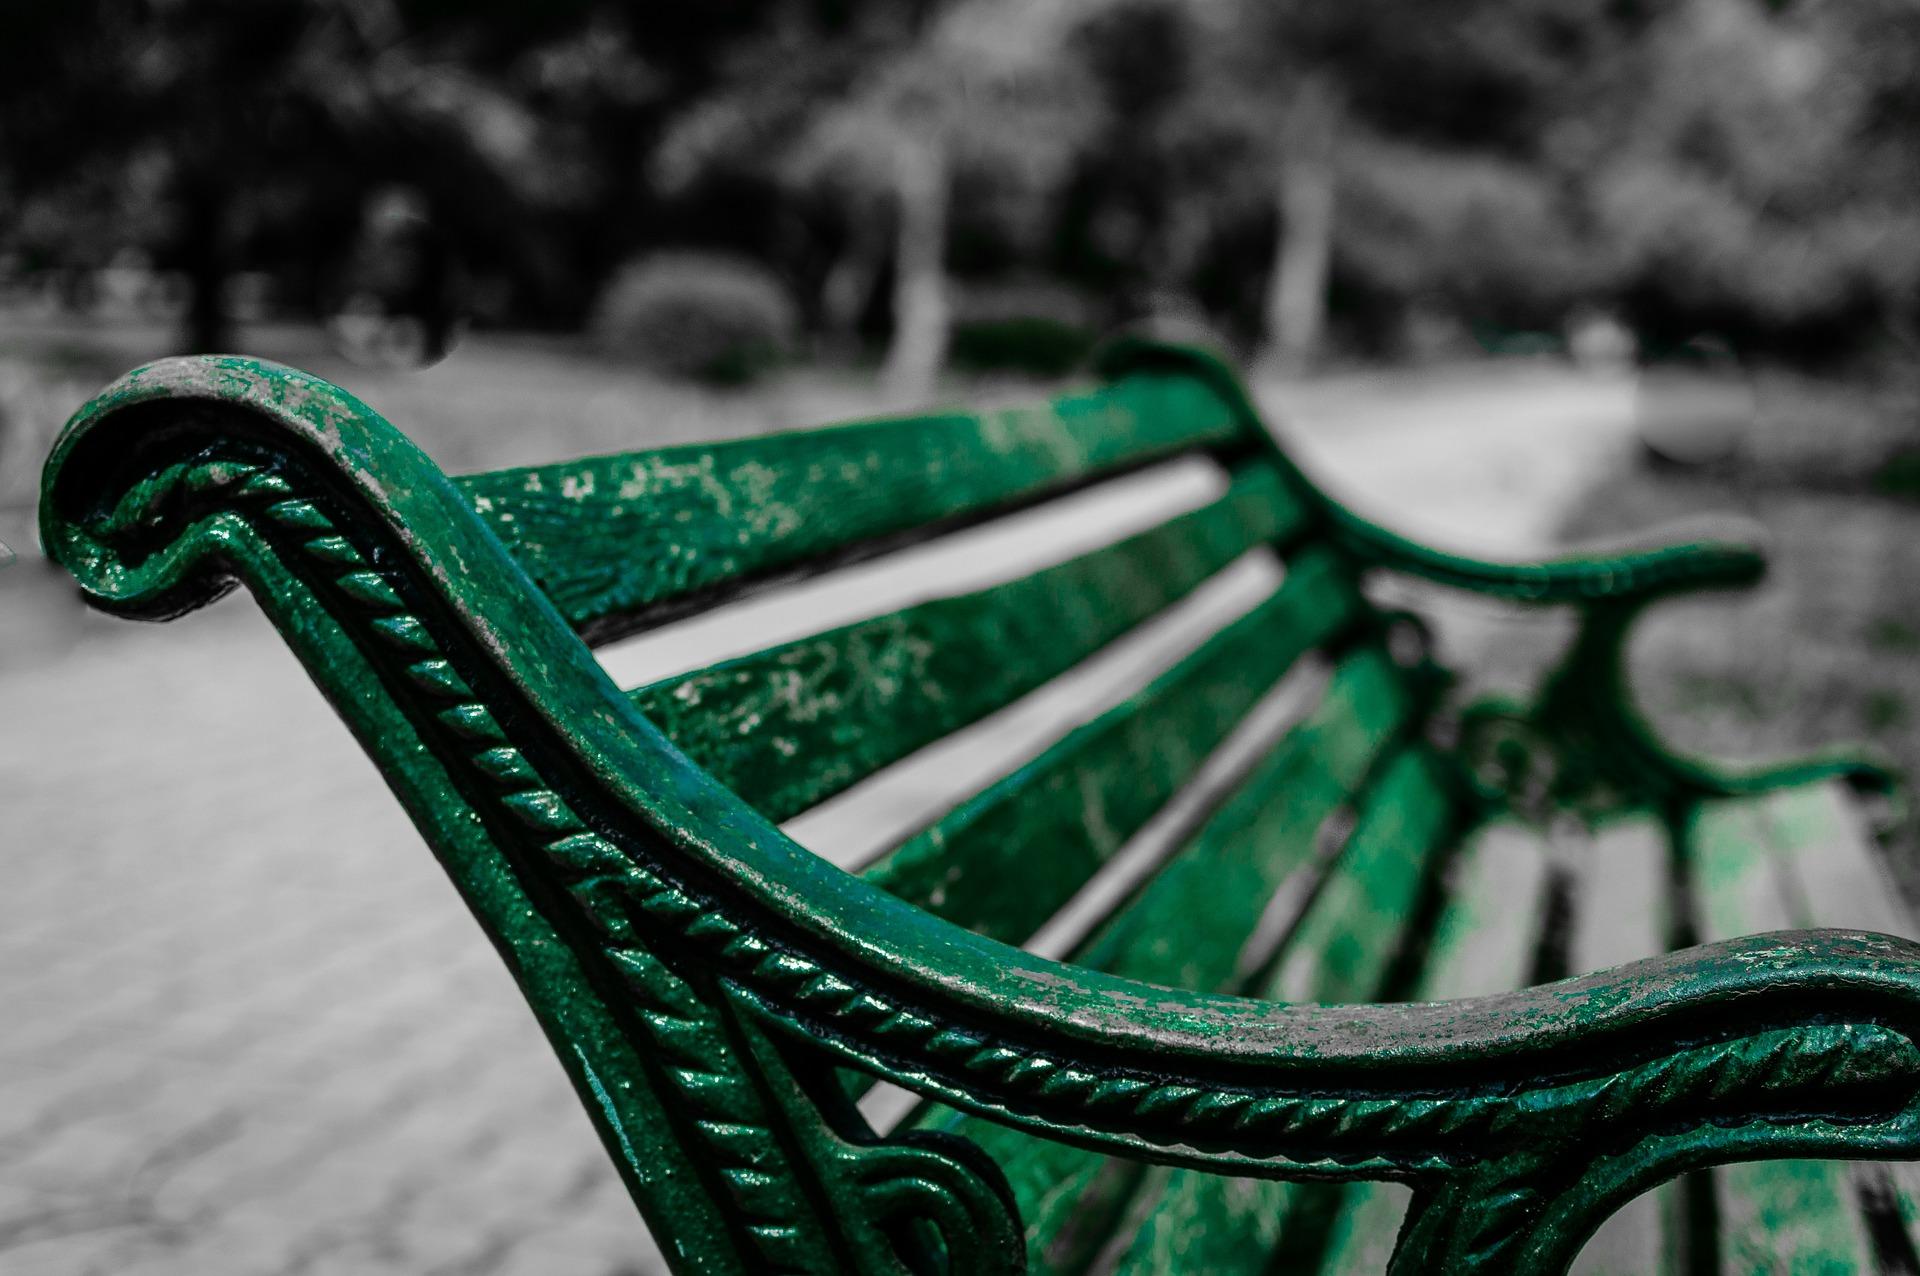 Bank, Park, Sitz, Rest, Ruhe, Entspannen Sie sich - Wallpaper HD - Prof.-falken.com